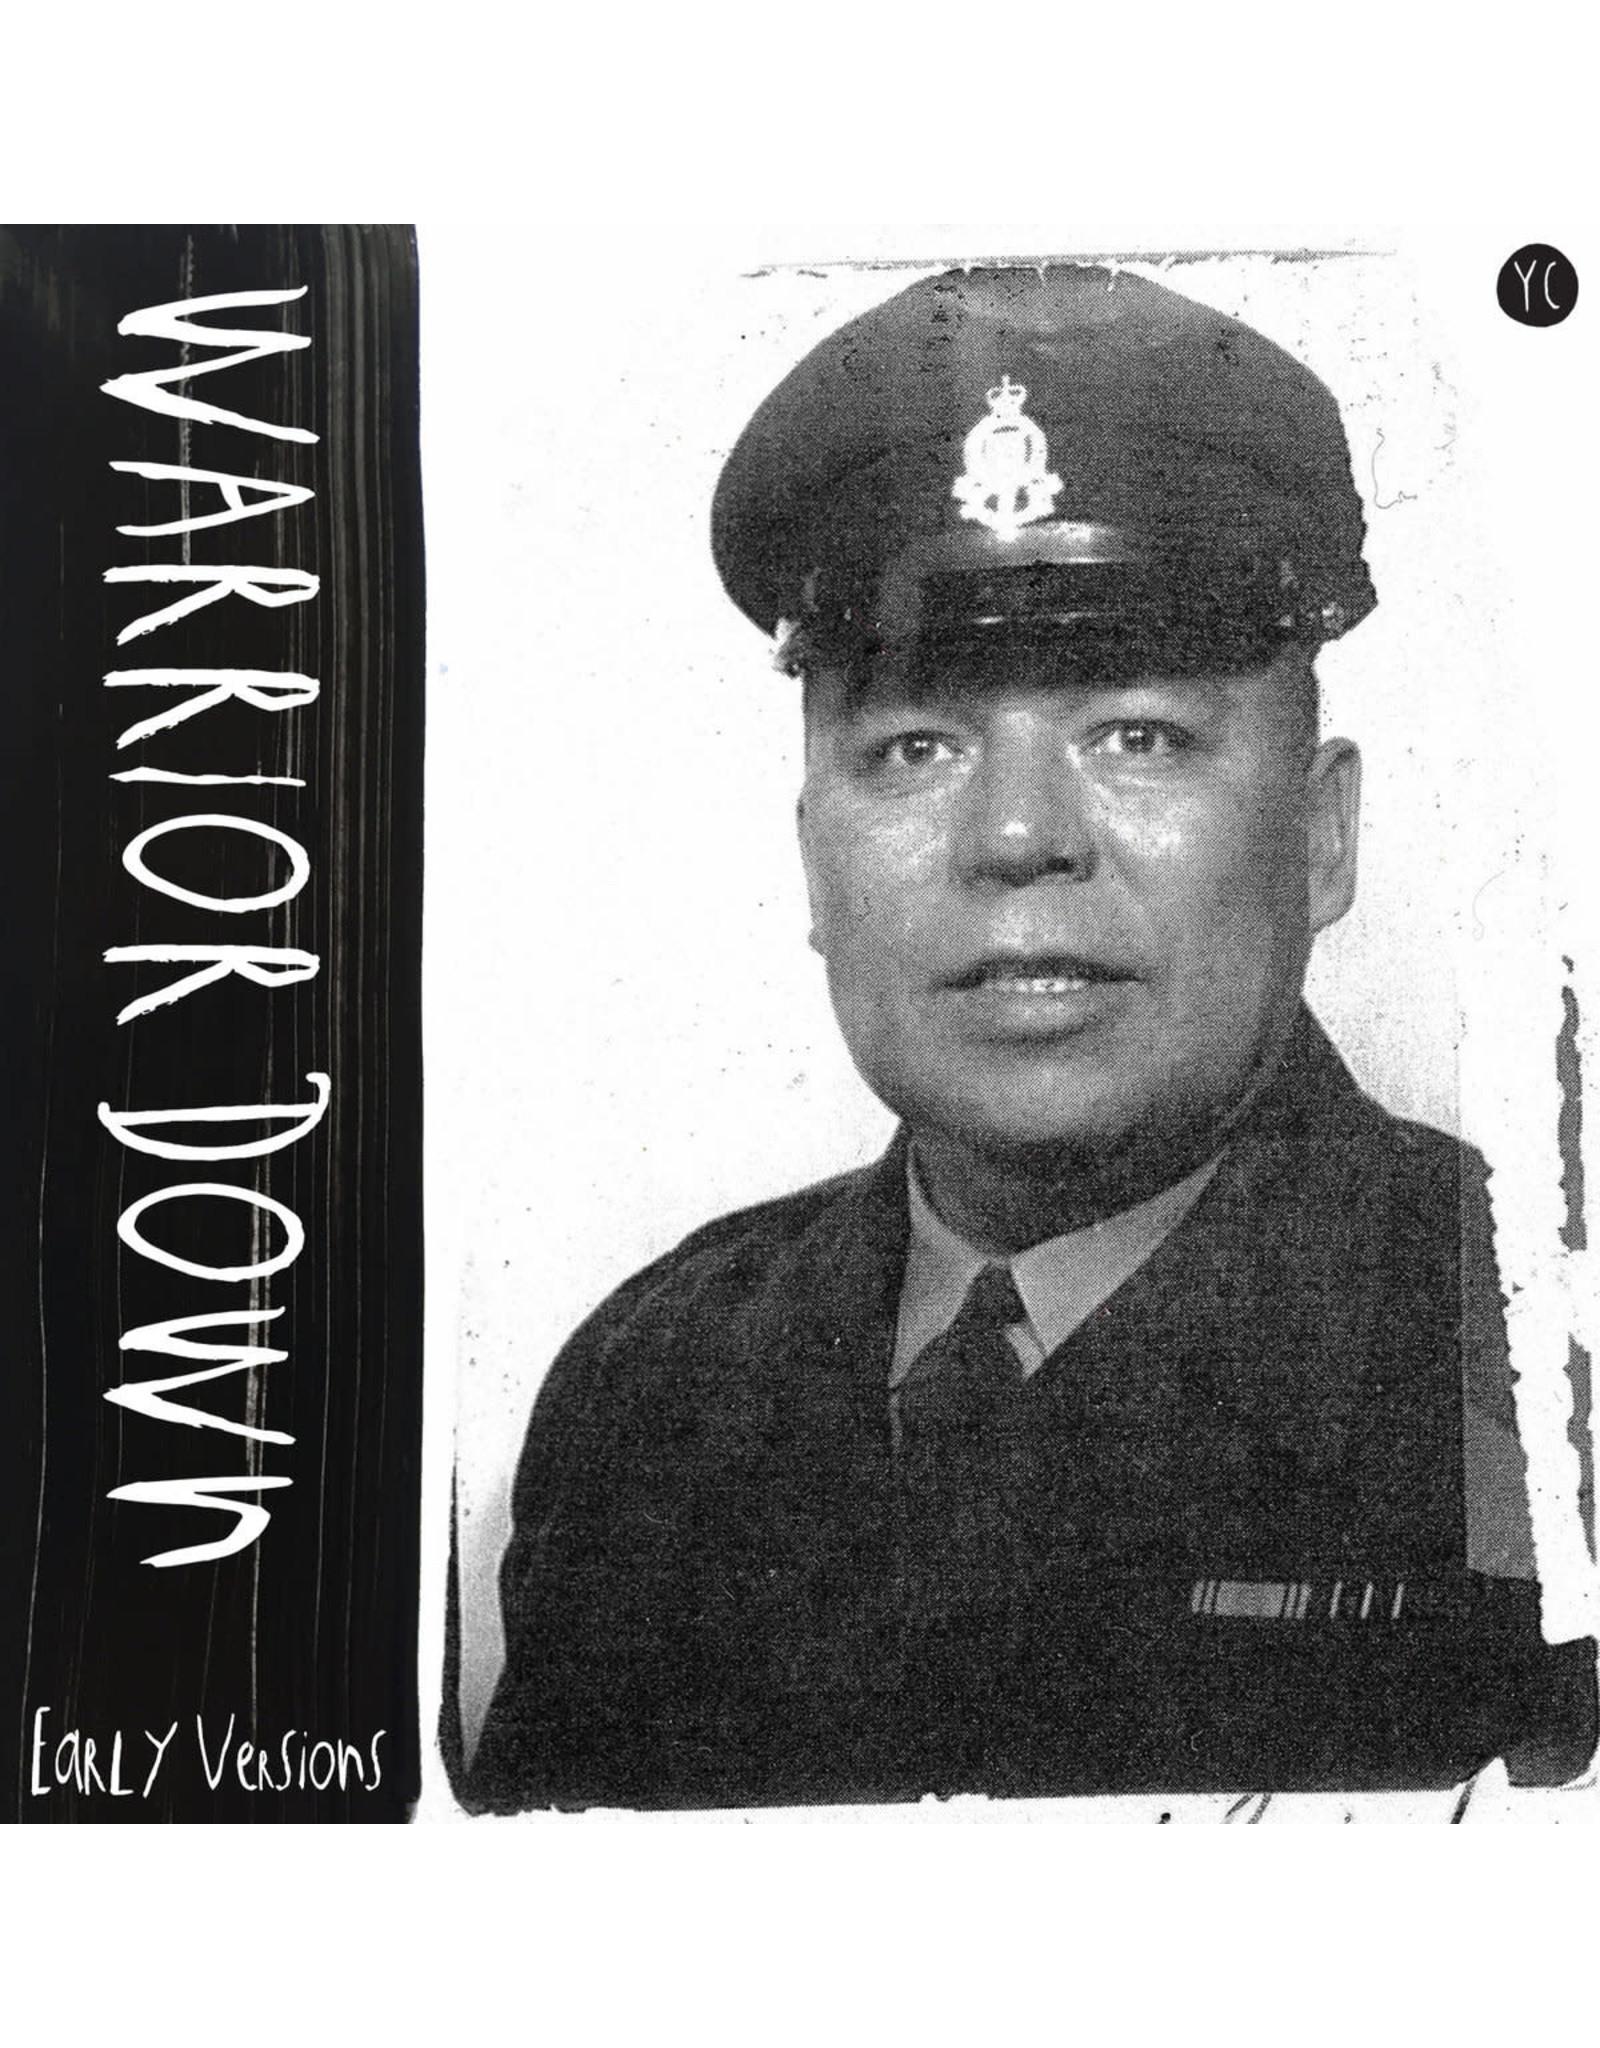 Whoop-Szo - Whoop-Szo CD